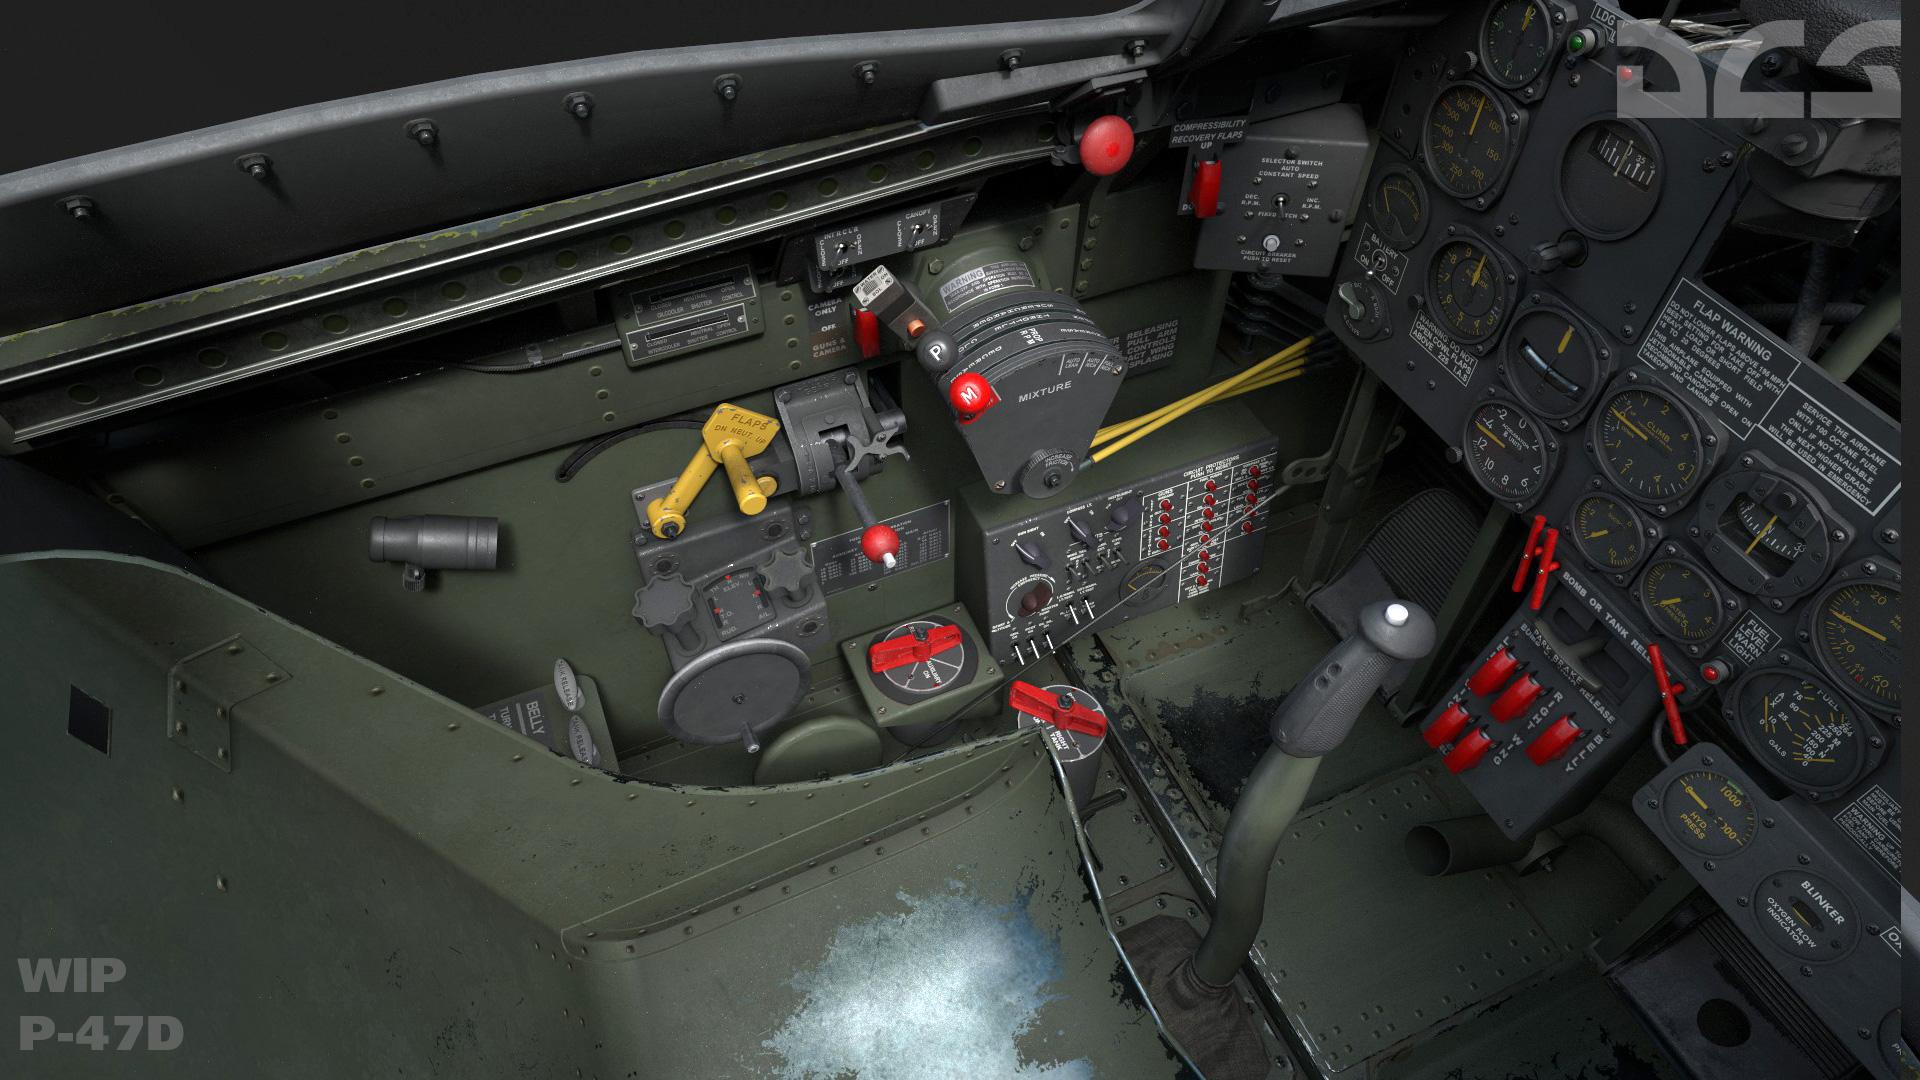 P-47D-cockpit-WIP-02.jpg